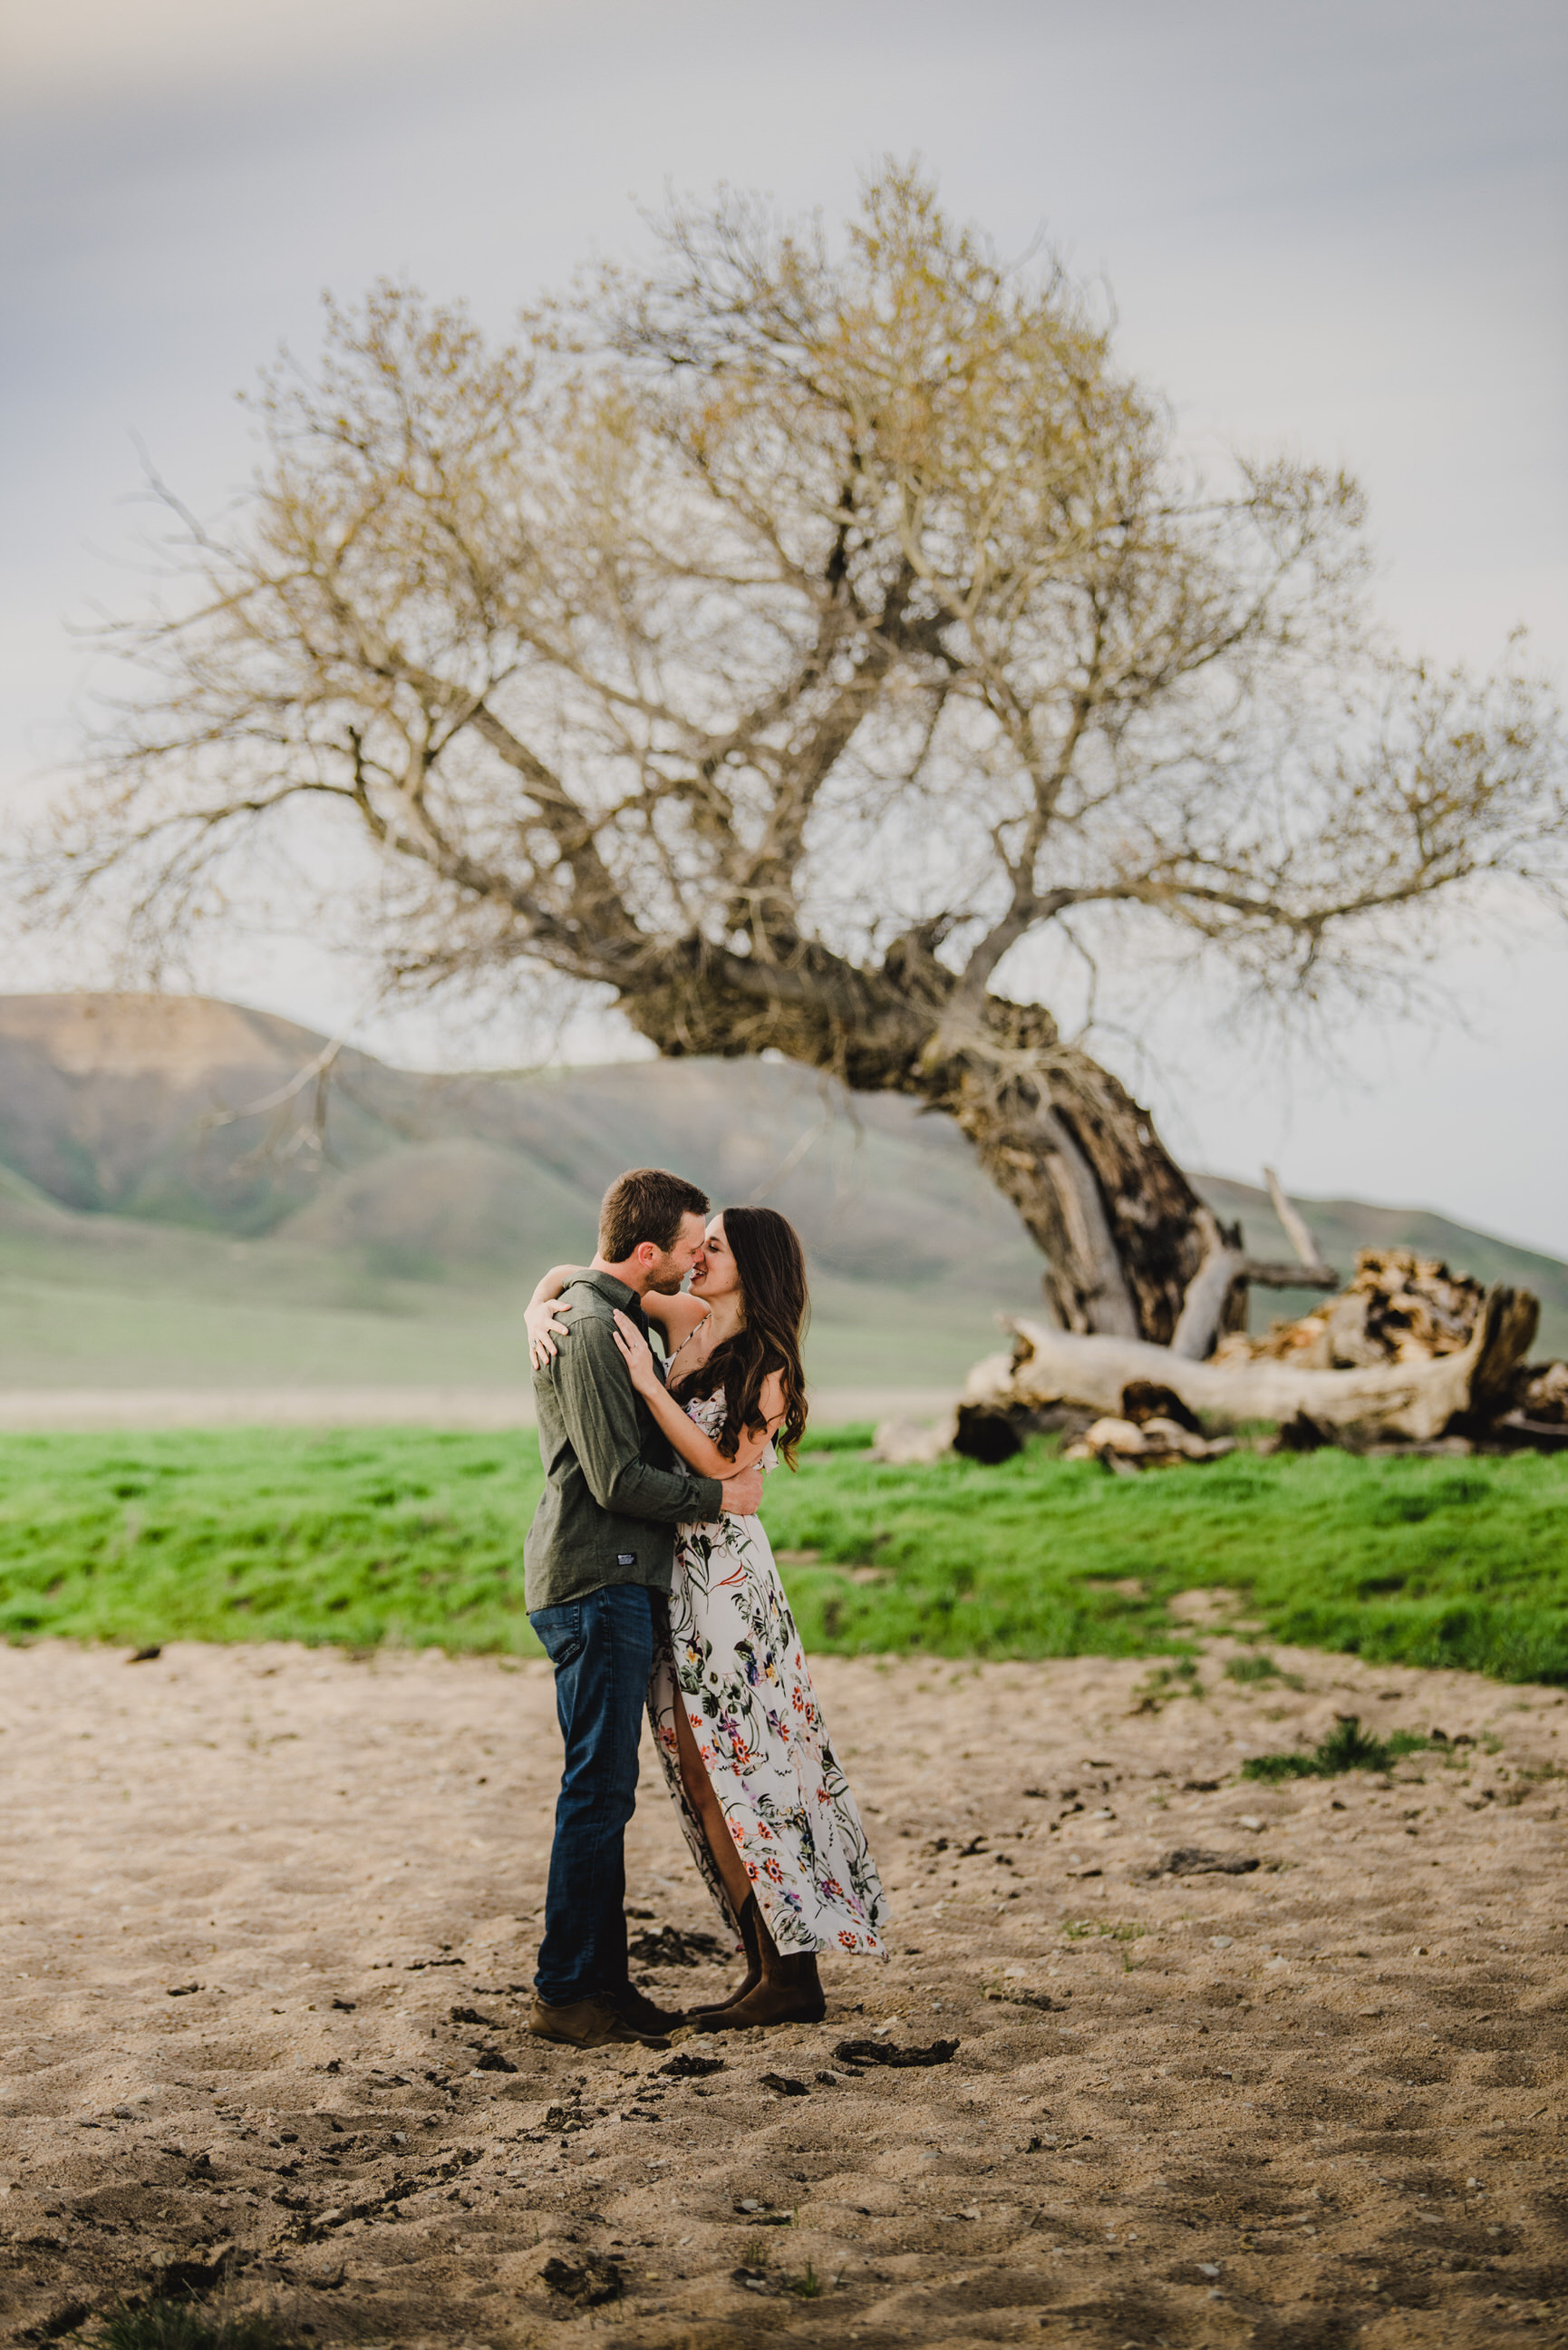 Shannon & Jared ~ Engaged_086.jpg